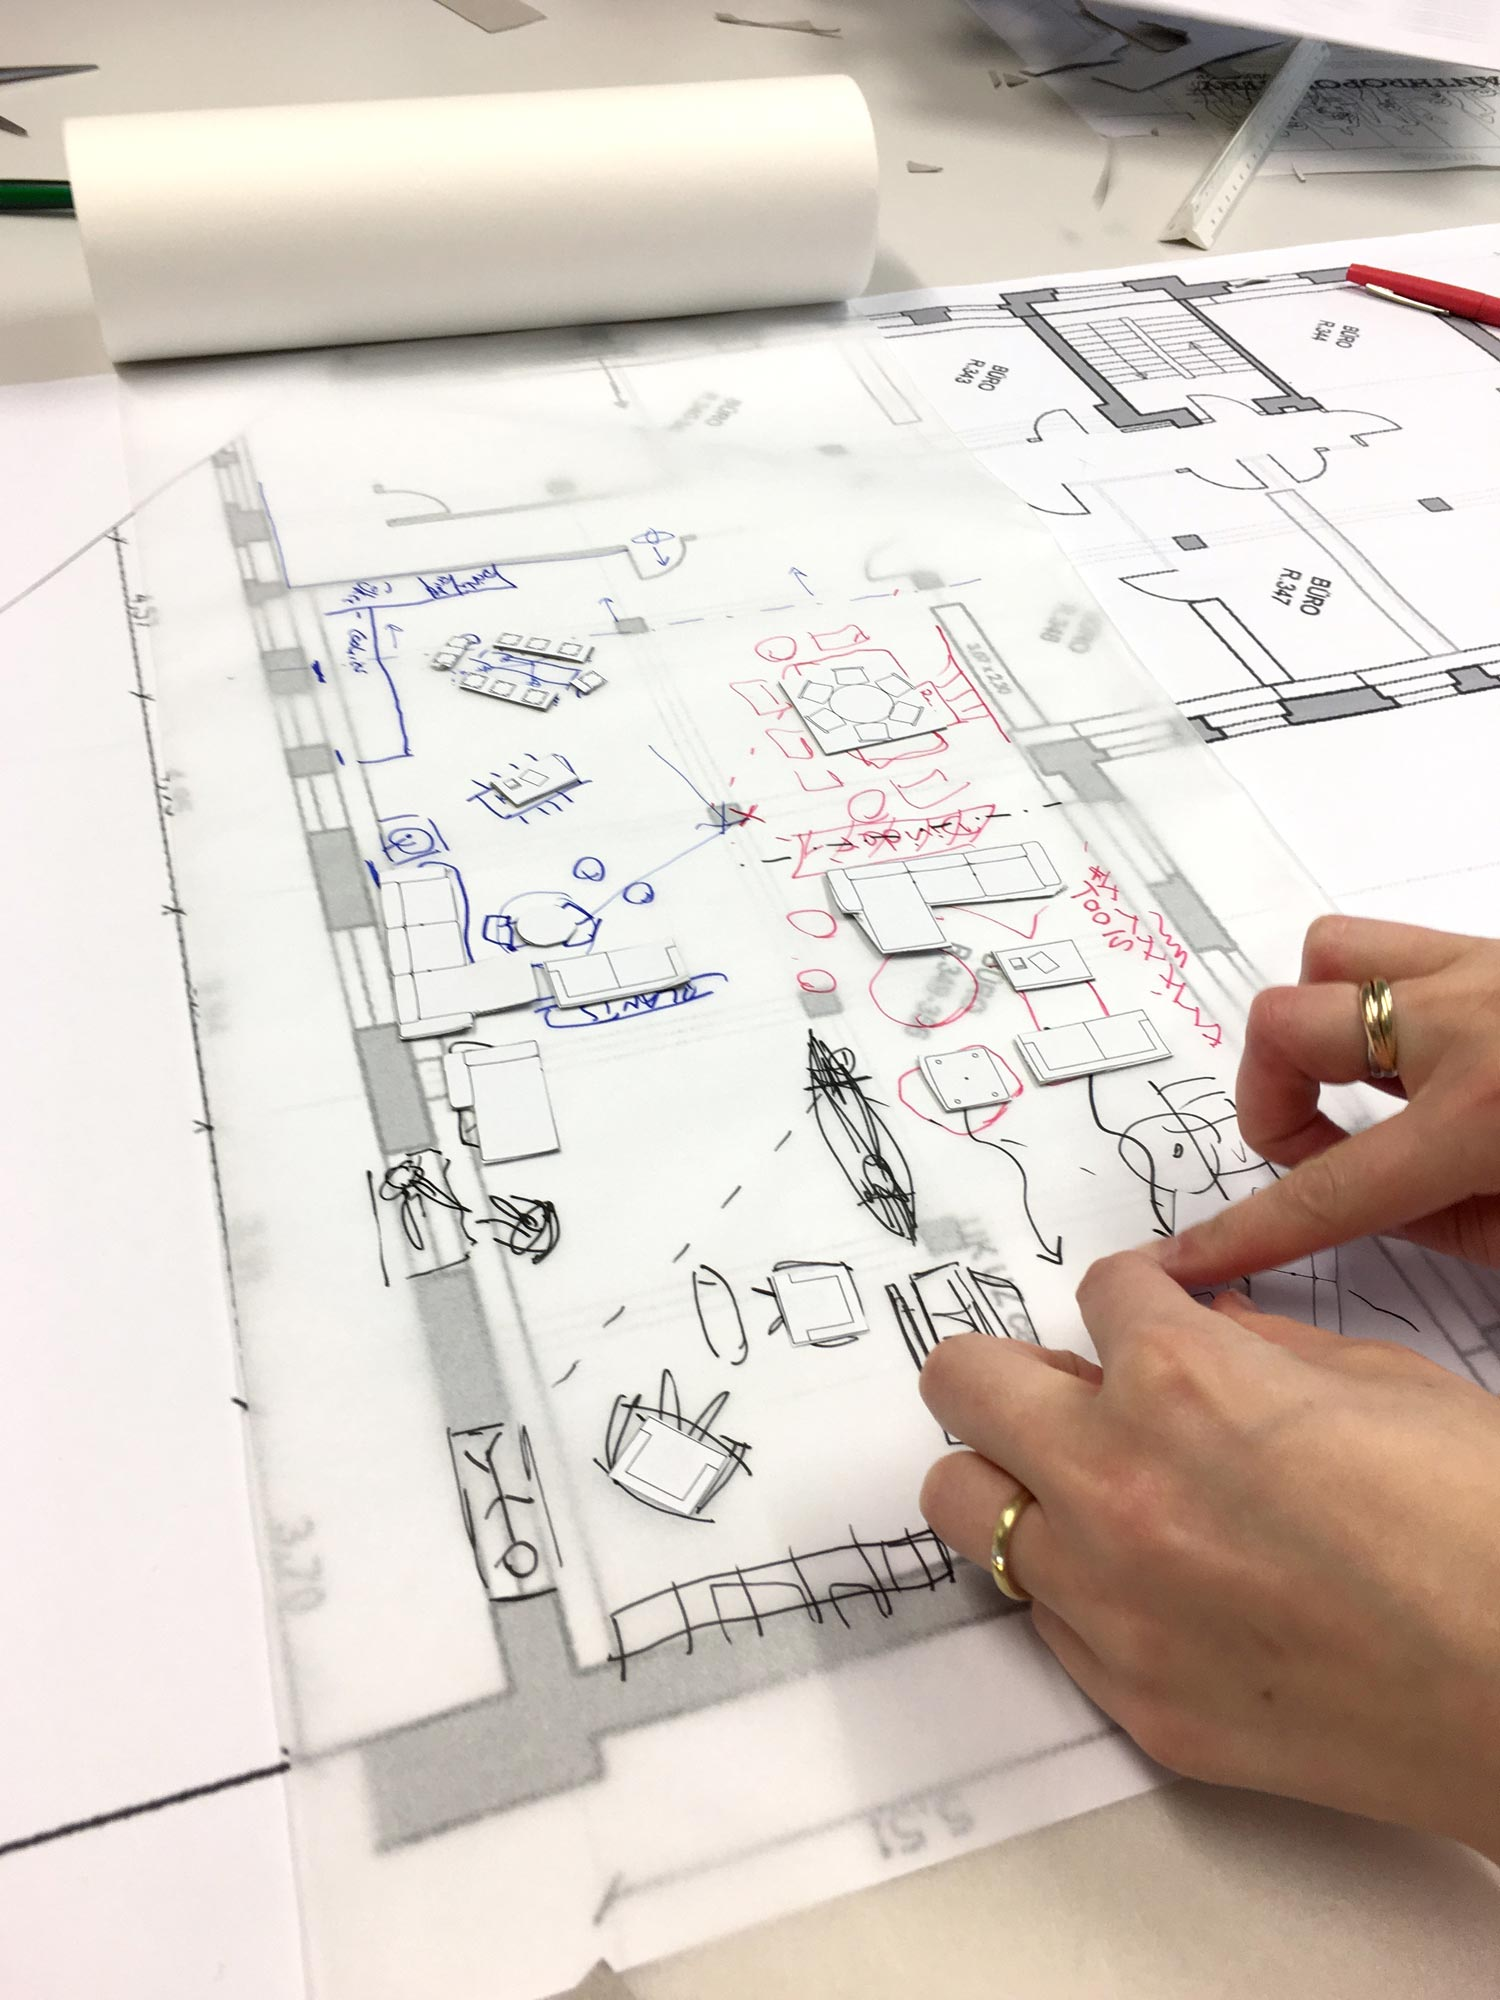 Architecture-London-Design-Freehaus-Workspace-Bahlsen-6.jpg